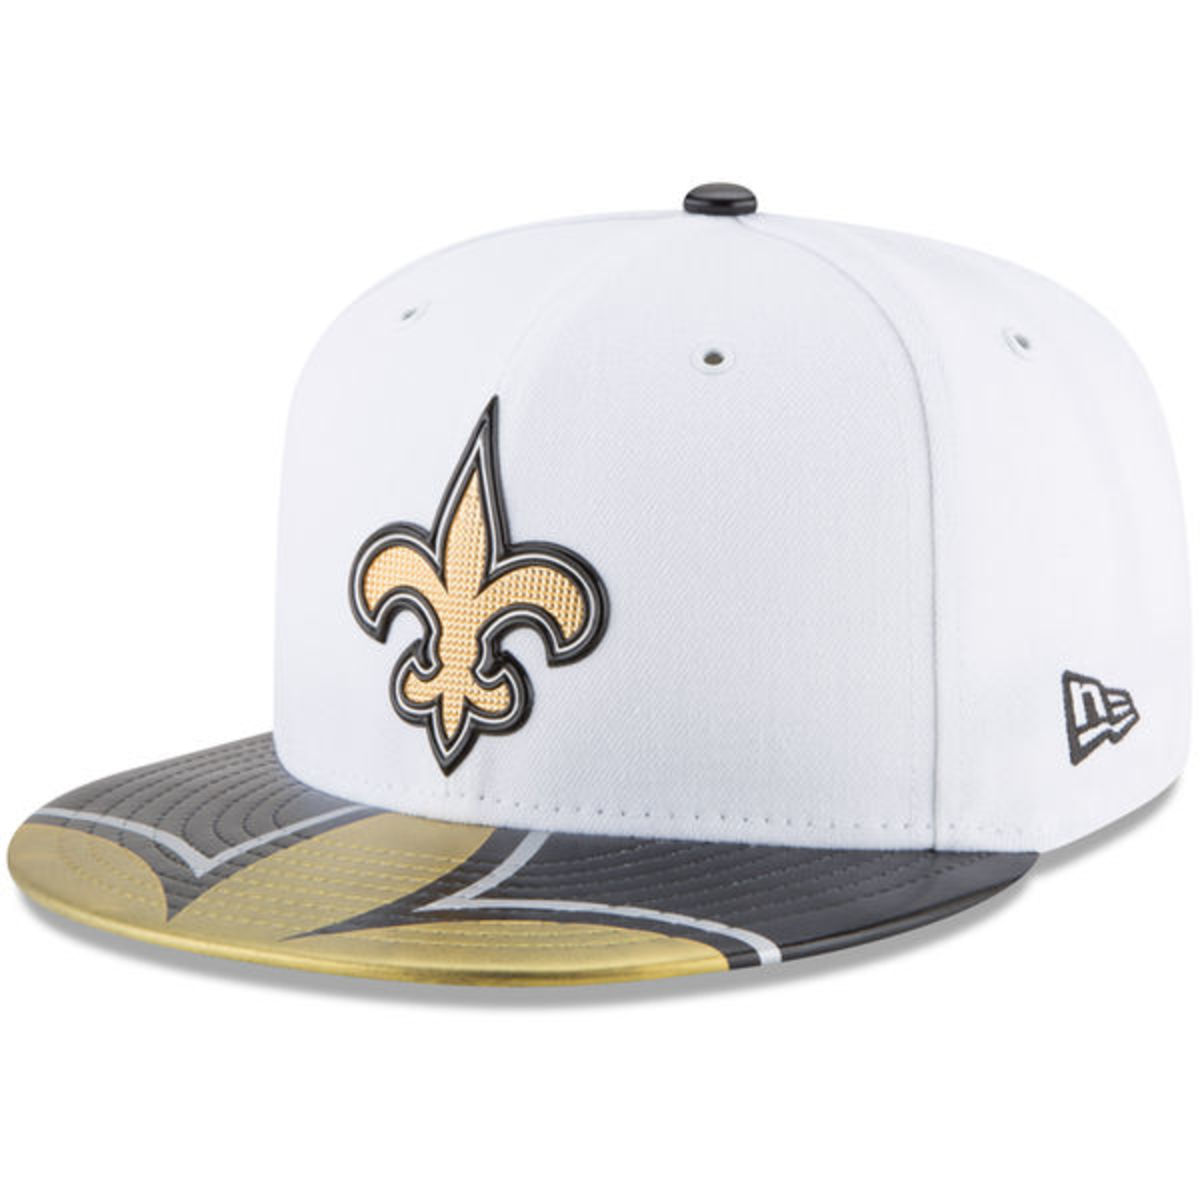 saints-draft-hat-rankings.jpeg